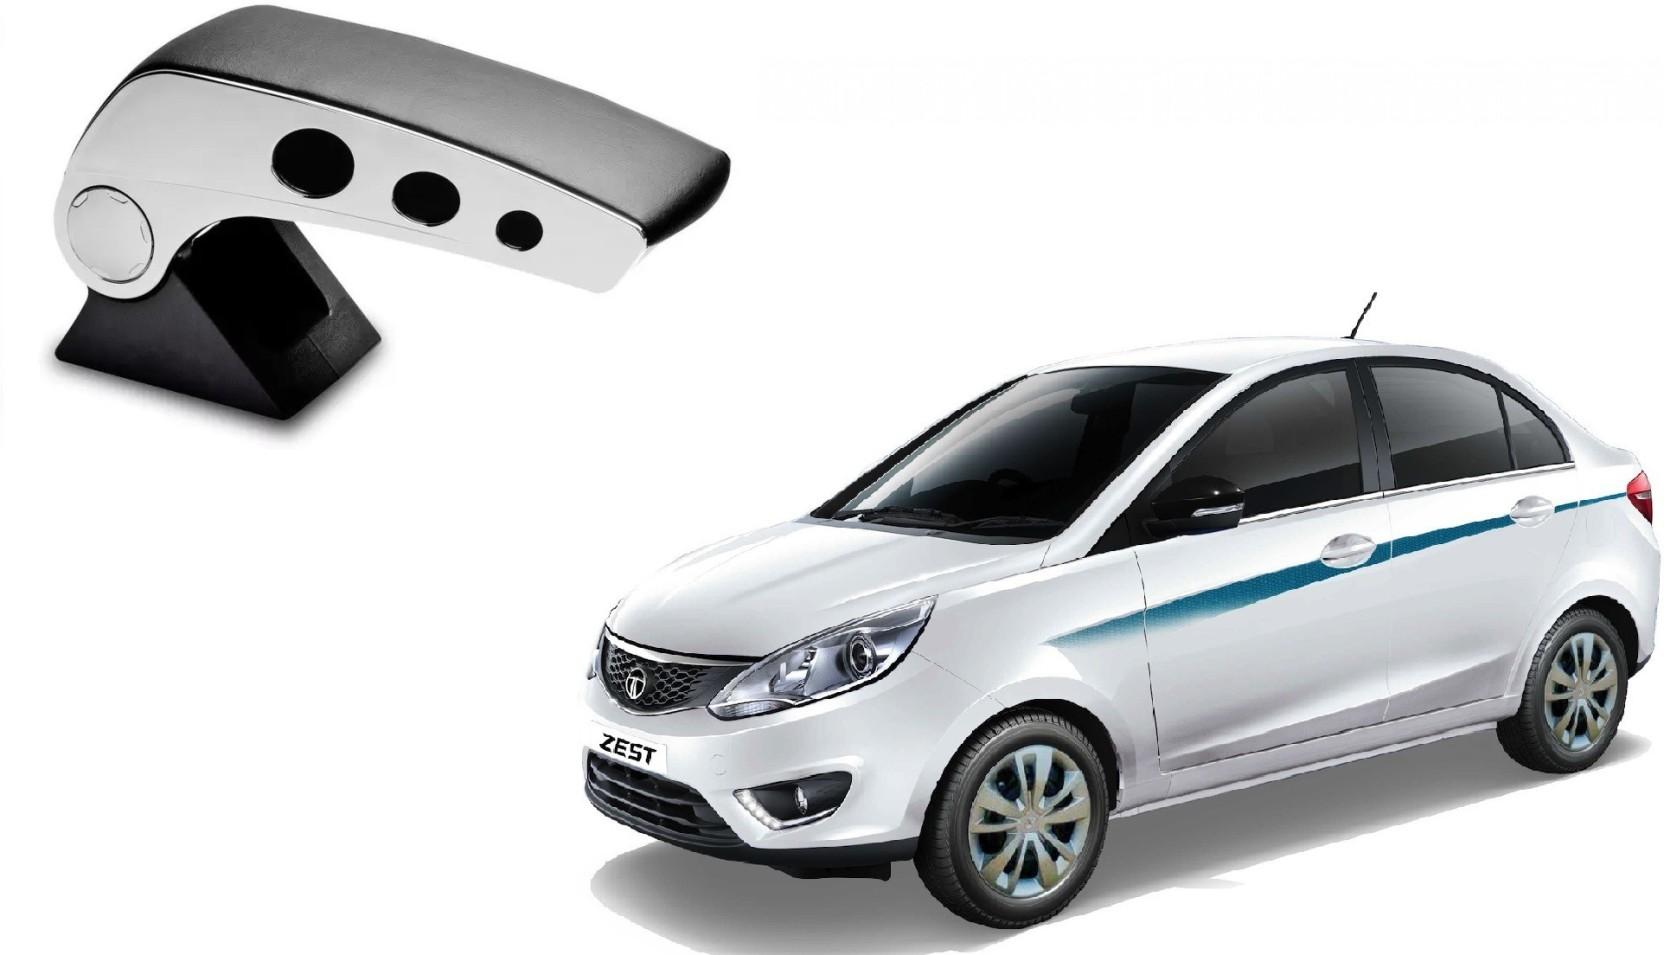 Auto Car Winner Zest Car Armrest Price in India - Buy Auto